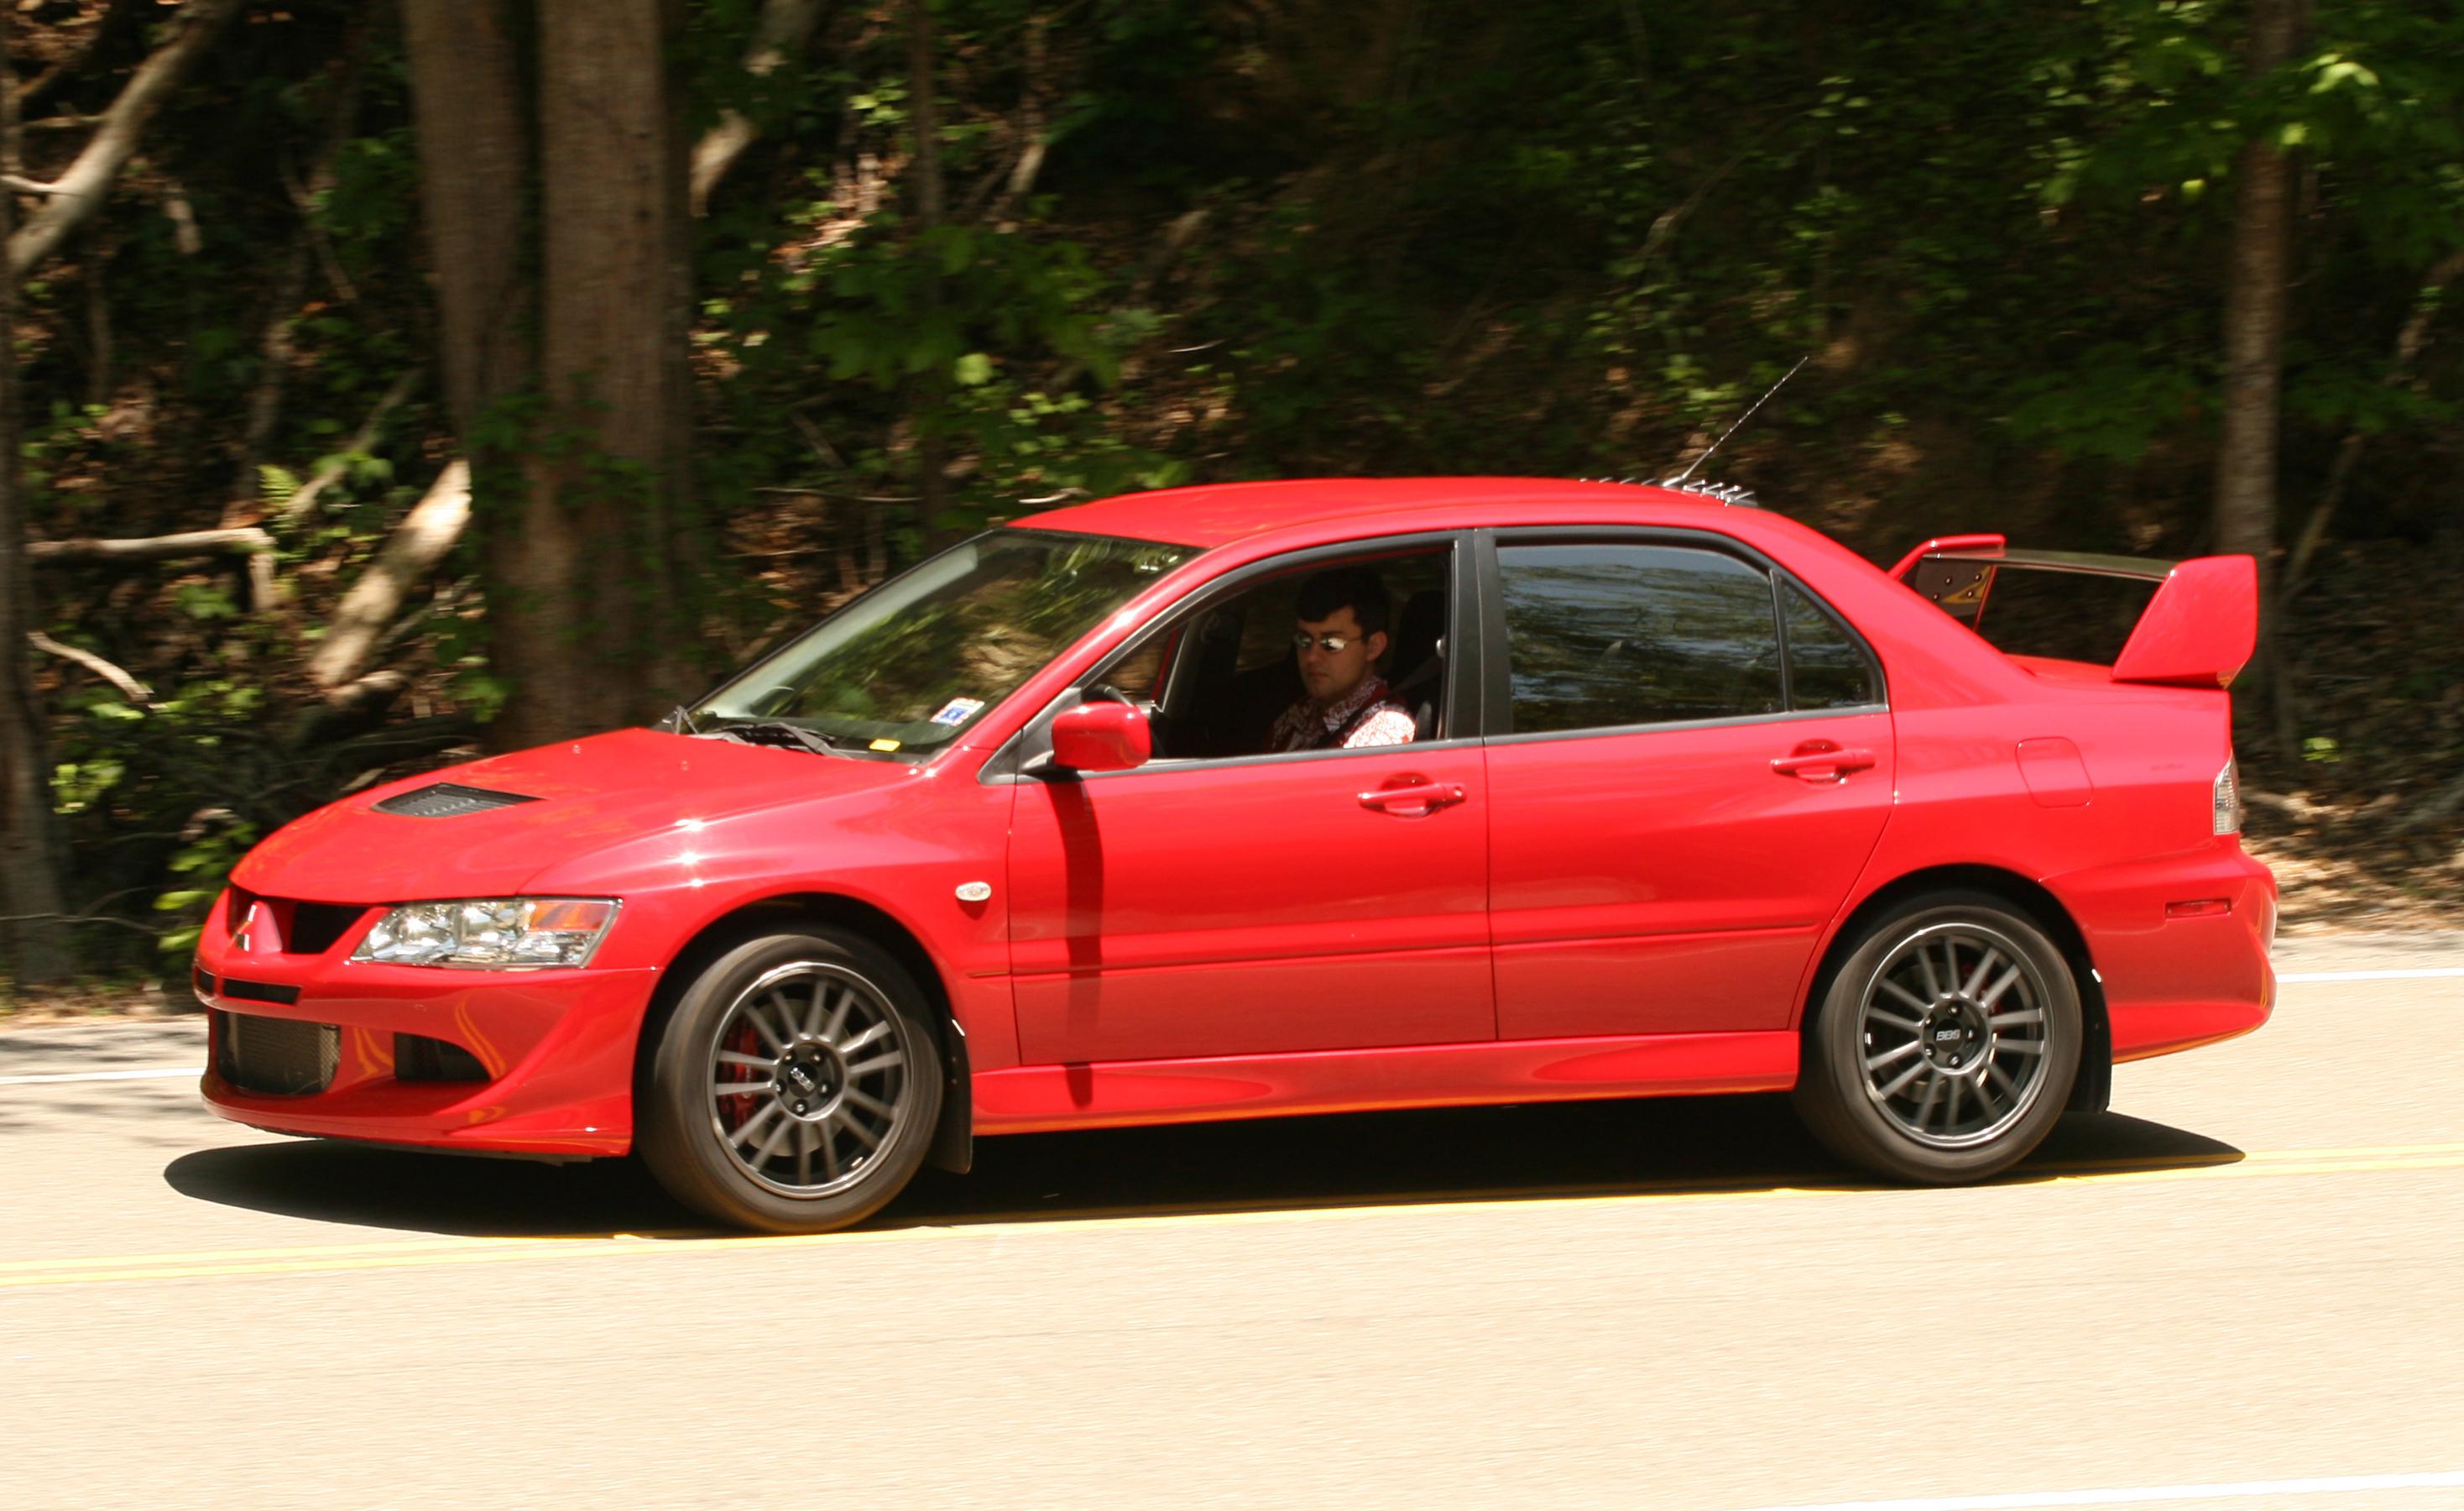 Mitsubishi Lancer Evolution IX 2005 - 2007 Sedan #1